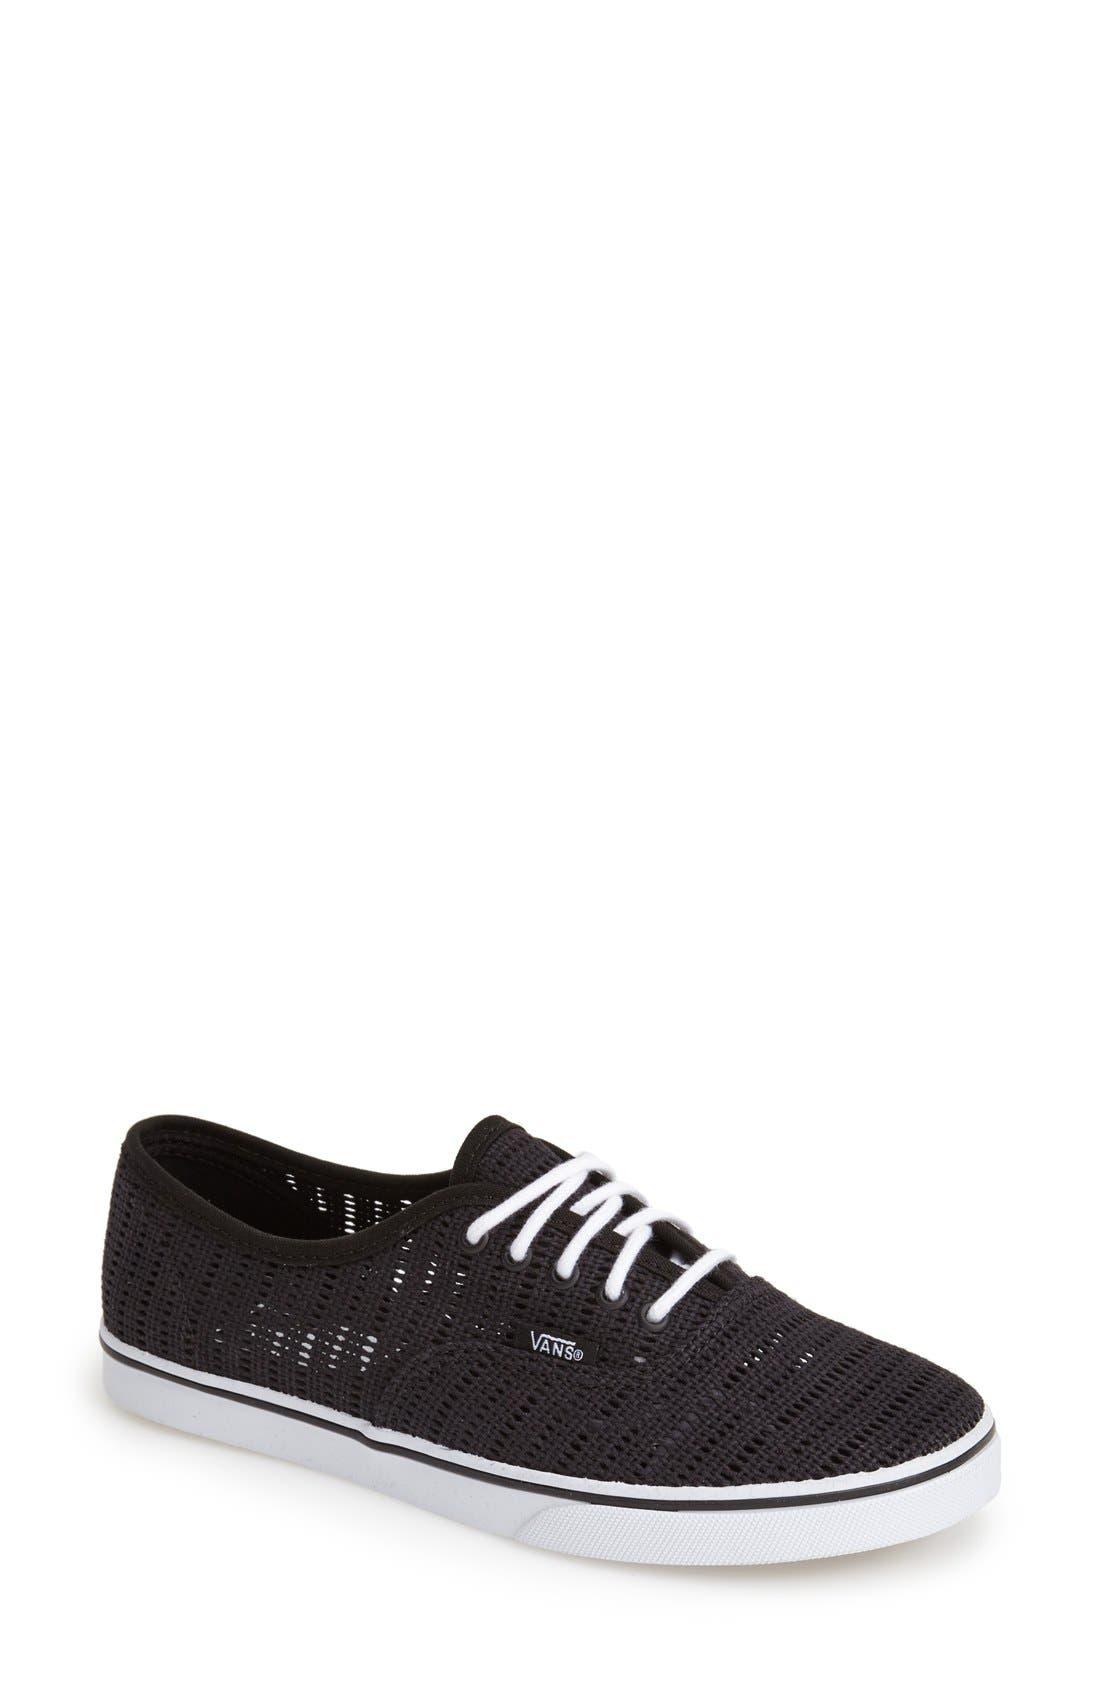 Alternate Image 1 Selected - Vans 'Lo Pro' Sneaker (Women)